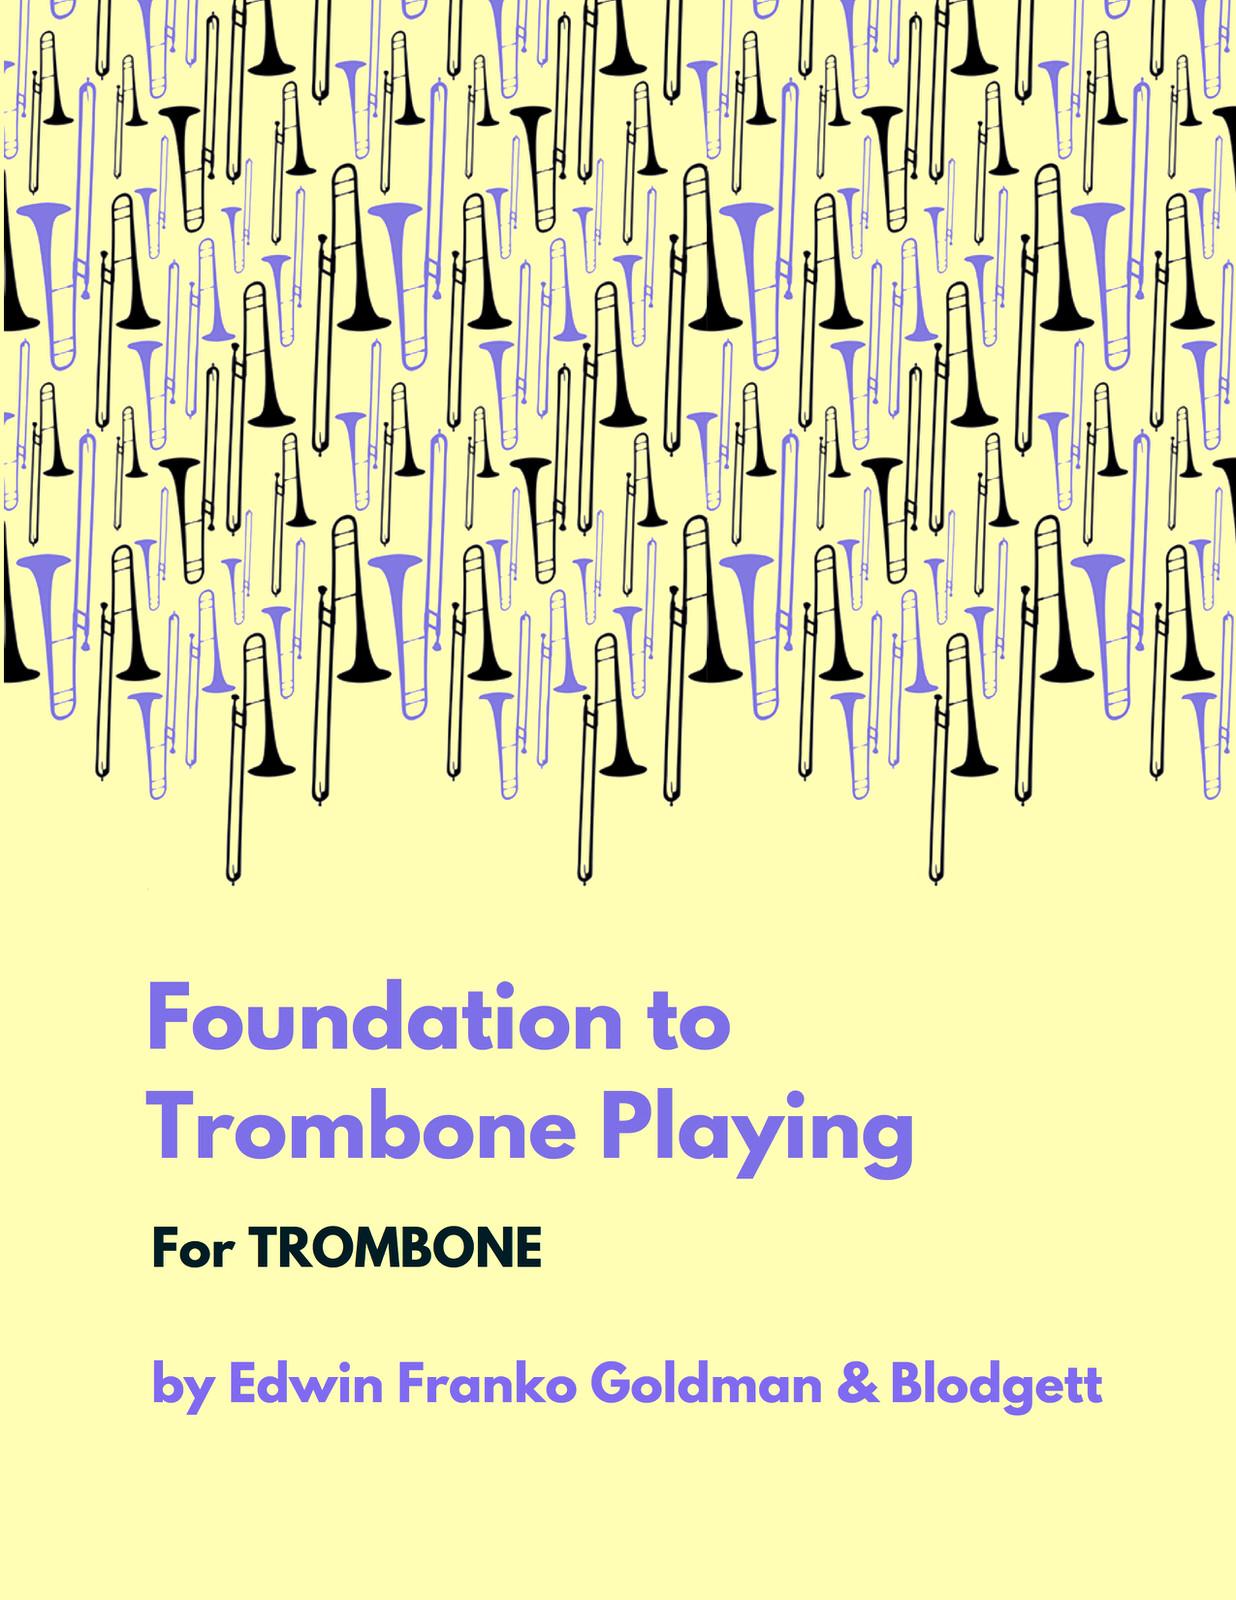 Goldman, Blodgett, Foundation to Trombone Playing